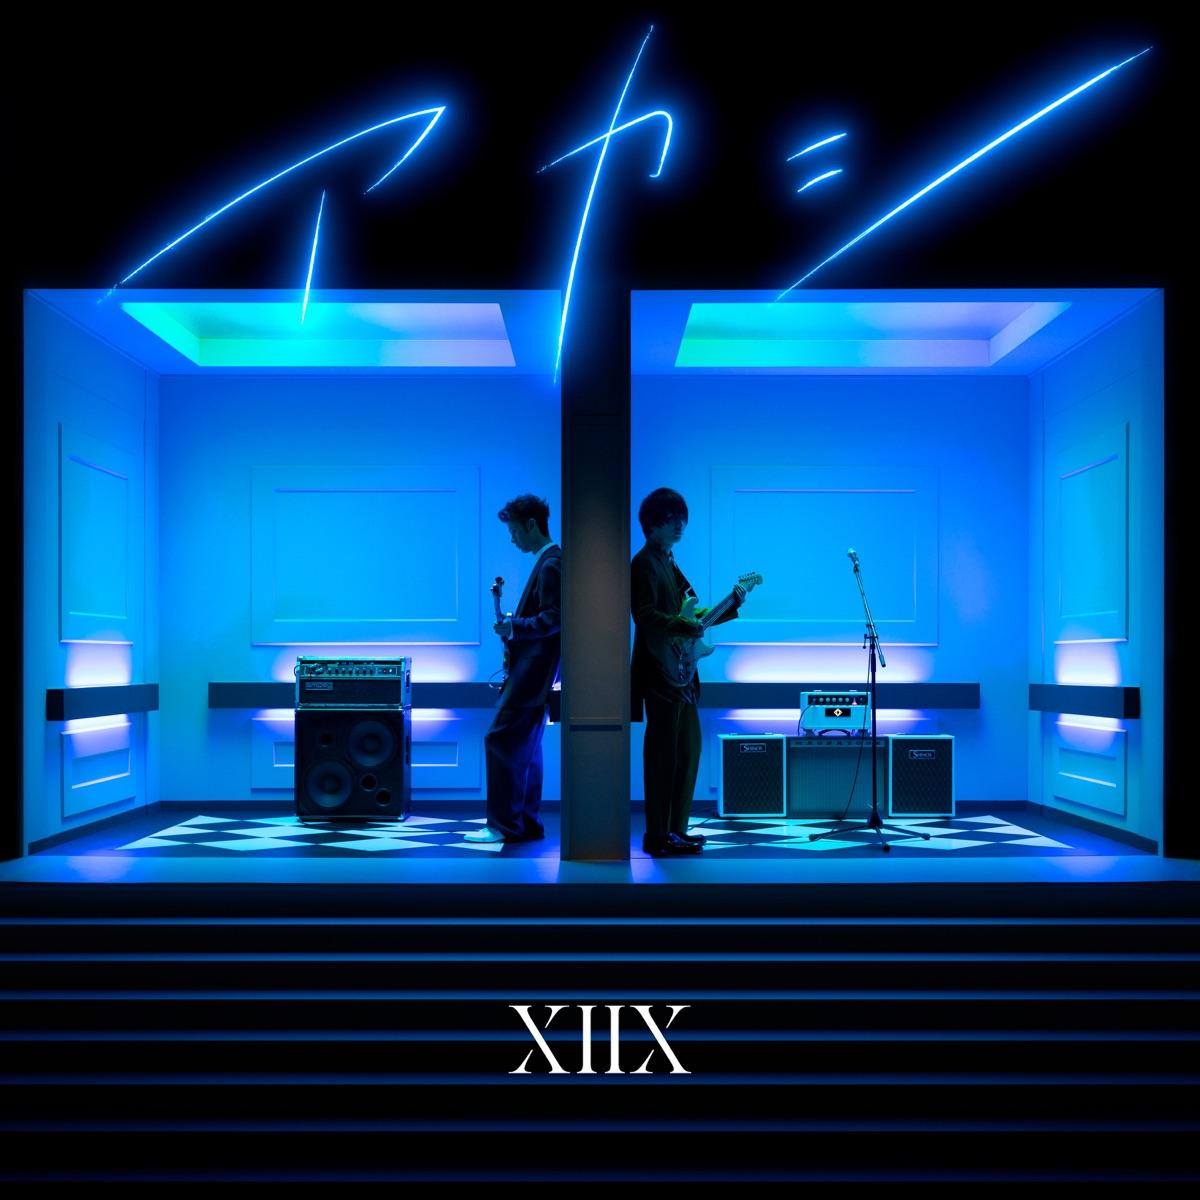 『XIIX - アカシ』収録の『アカシ』ジャケット